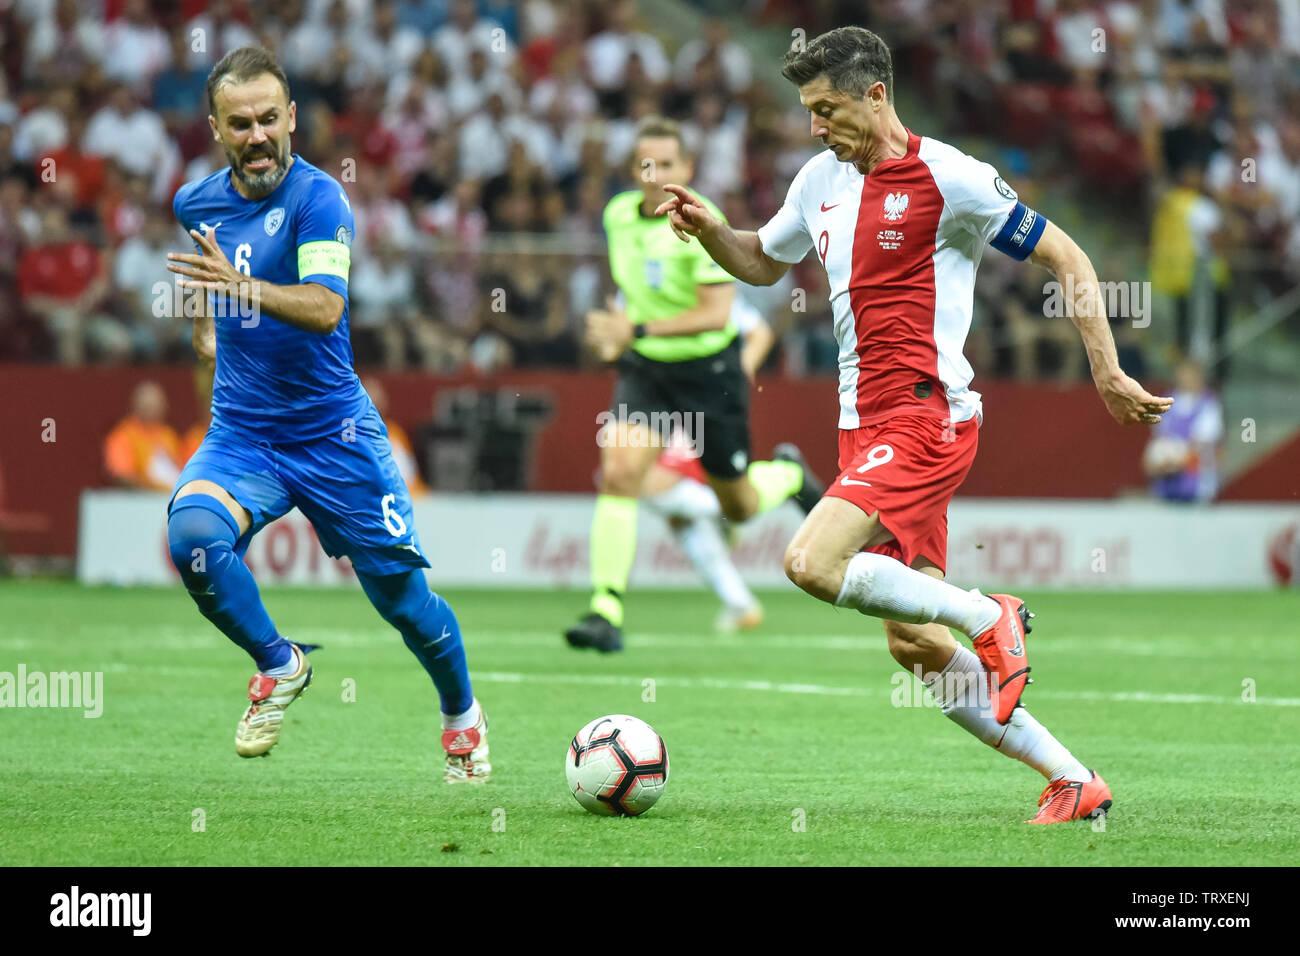 WARSAW, POLAND - JUNE 10, 2019: Qualifications Euro 2020  match Poland - Israel 4:0. In action  Bibras Natcho (L) and Robert Lewandowki (R). - Stock Image